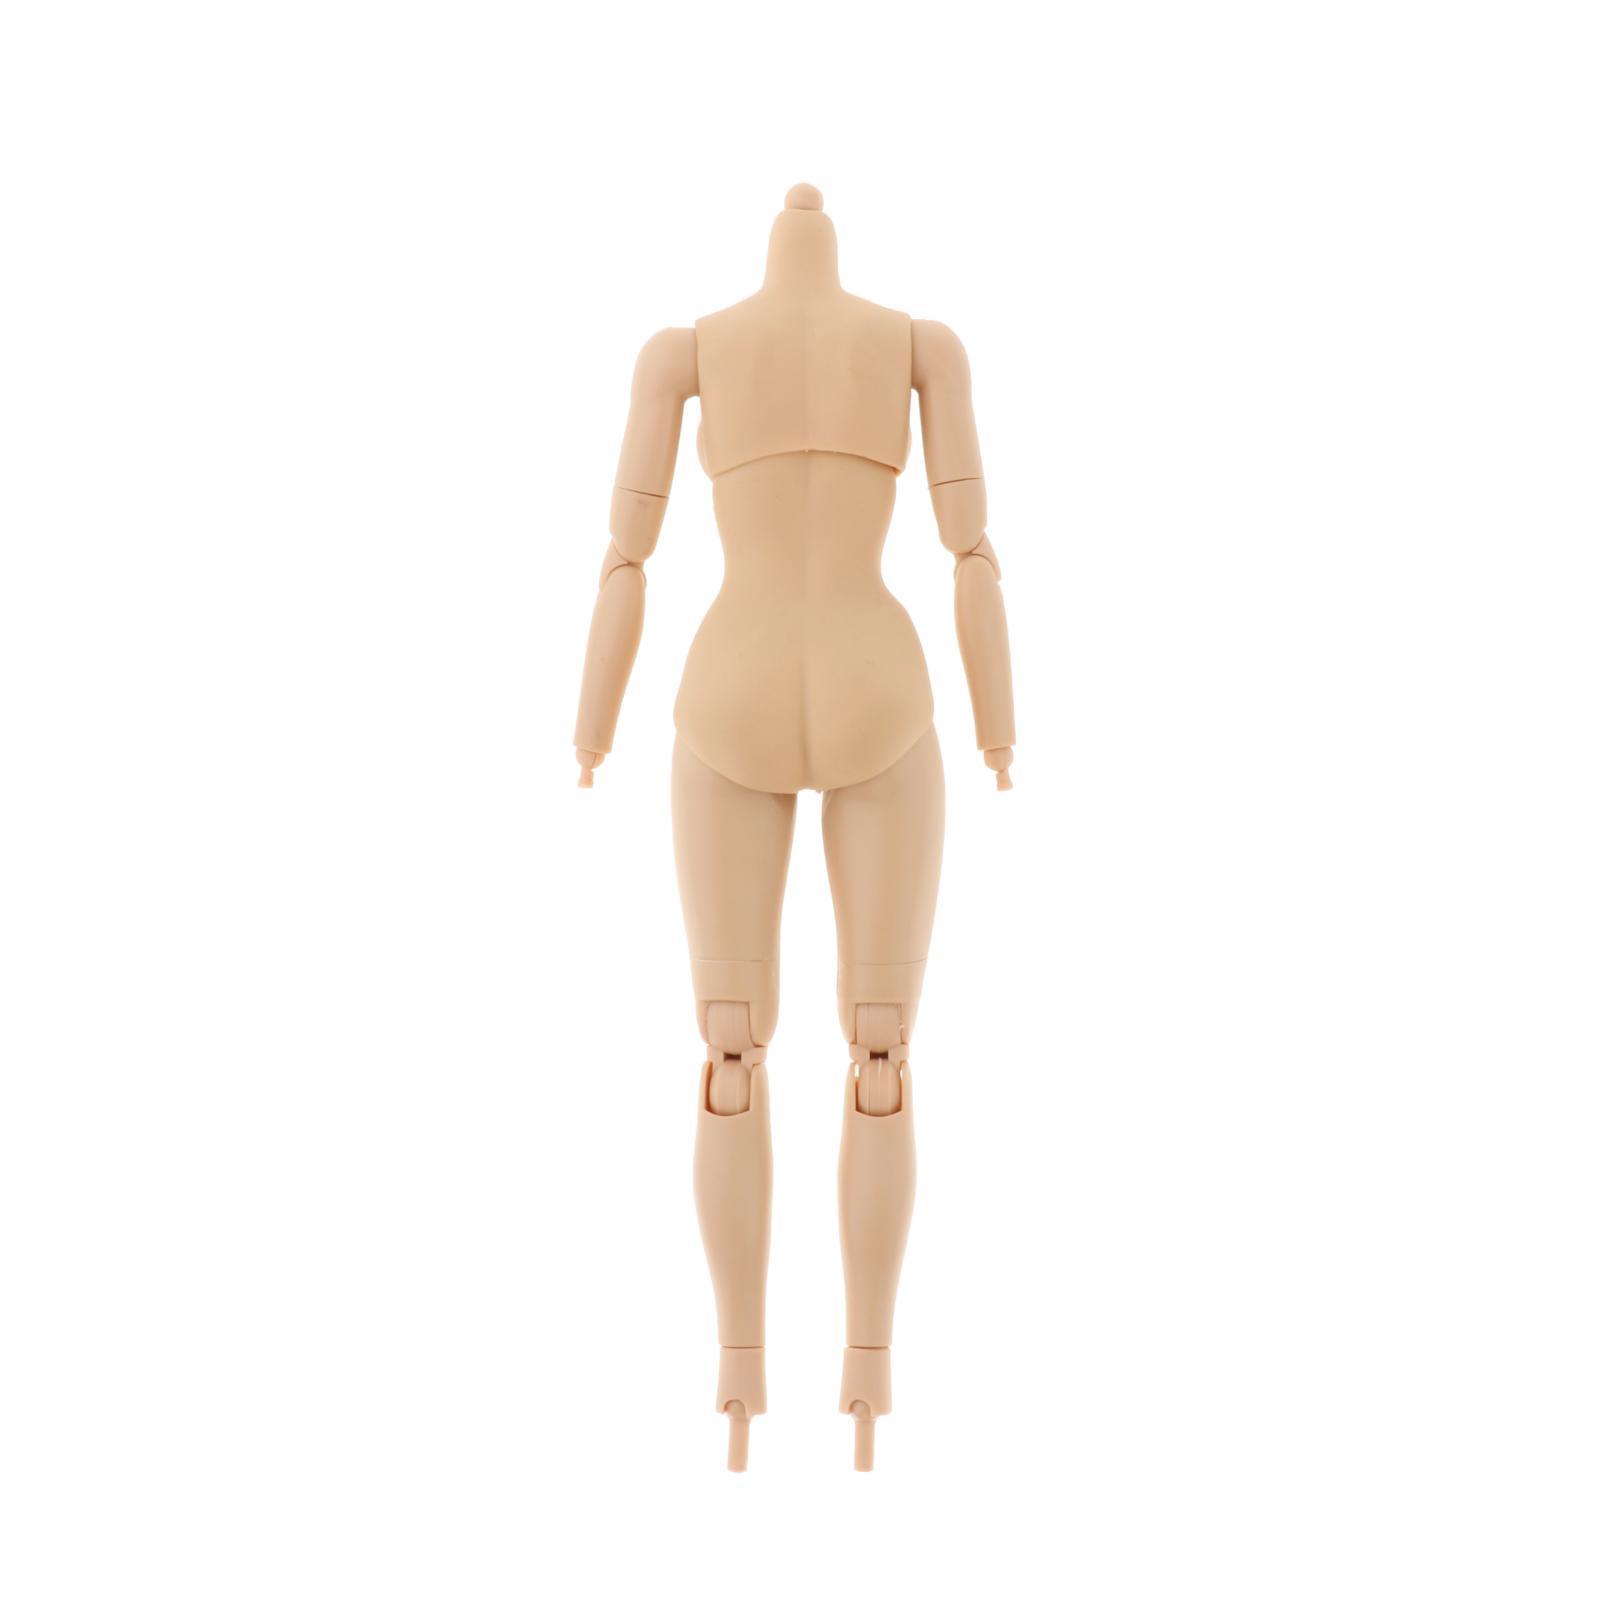 miniature 11 - 1/6 Scale Female Flexible Body 12 Inches Action Figure Body Seamless Figure